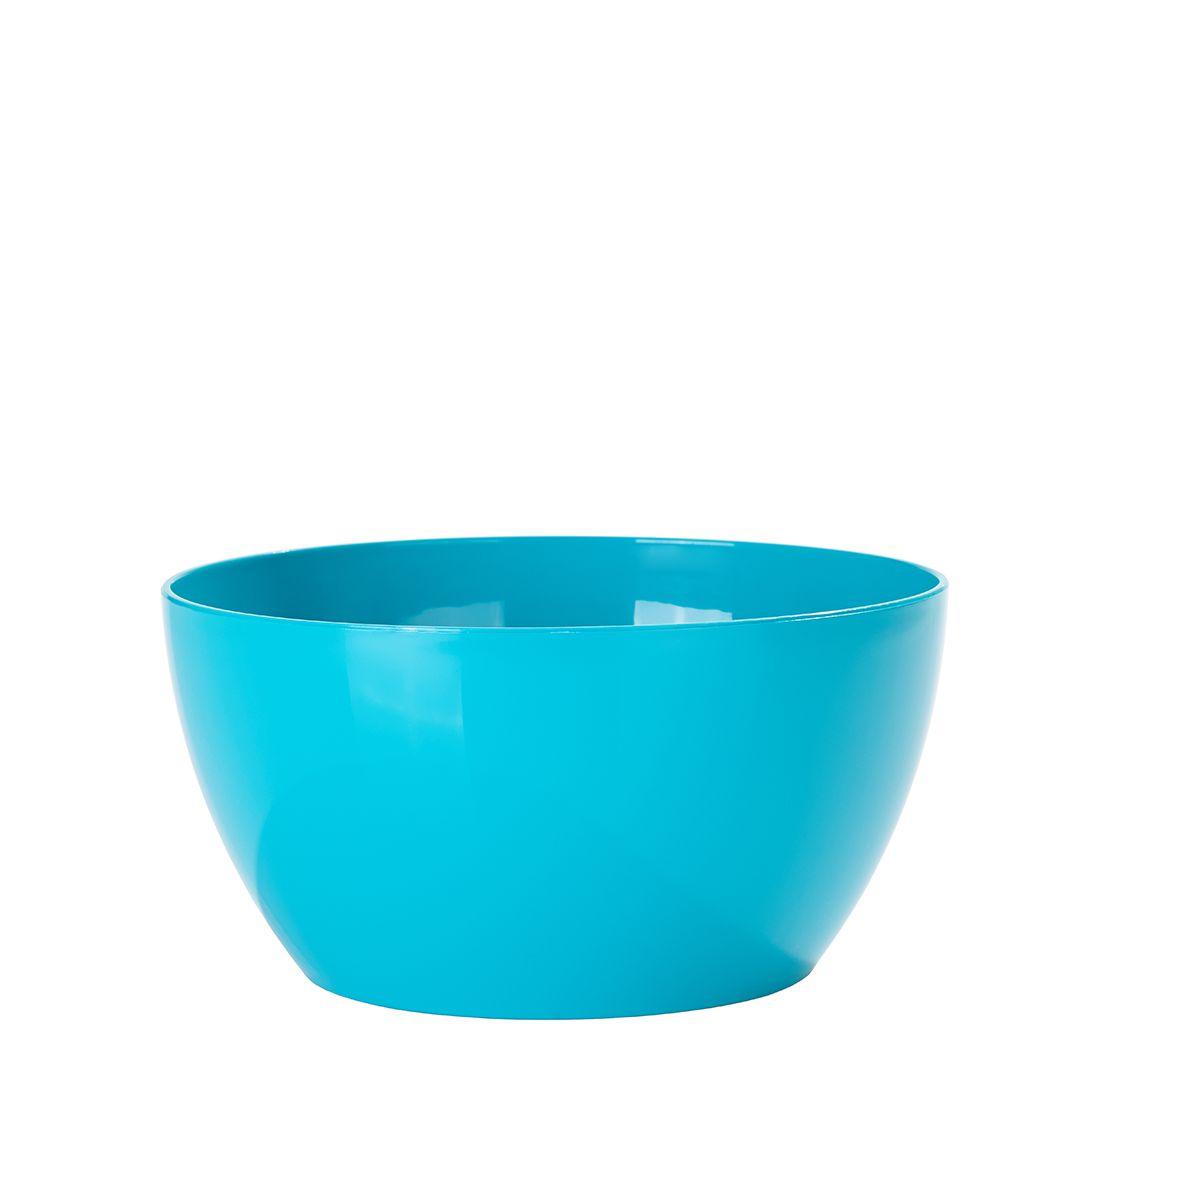 Bowl San Remo 23 x 12 cm Azul Turquesa Vasart